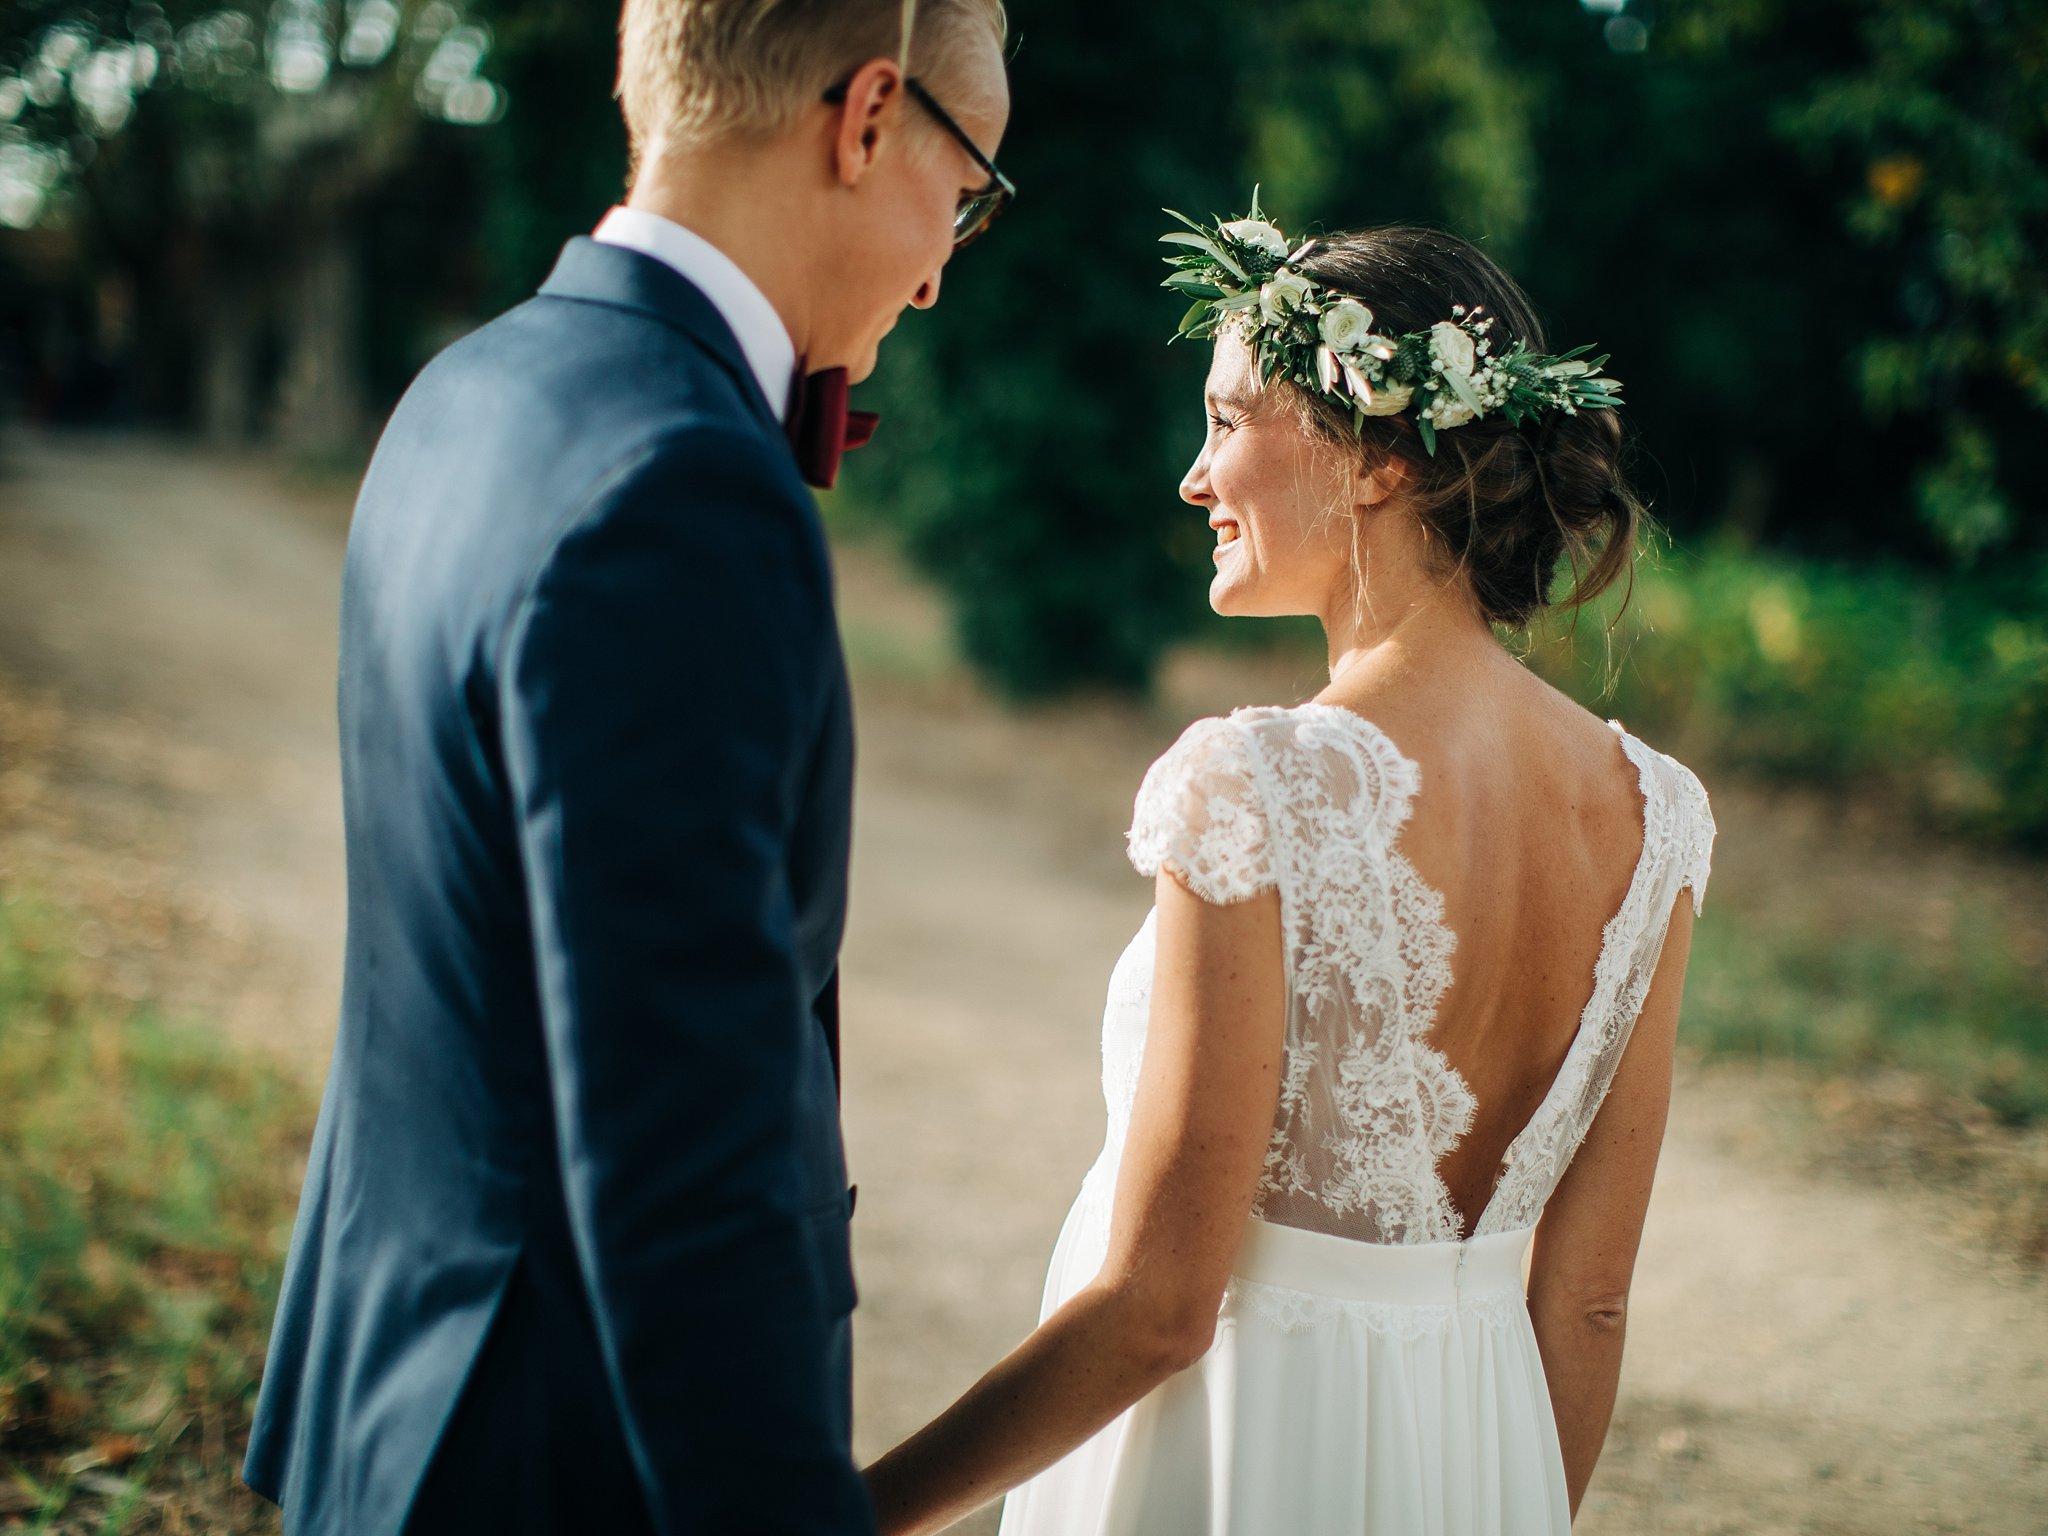 Wedding Photographer Perpignan - Château Las Collas Wedding - Hugo Hennequin094.jpg